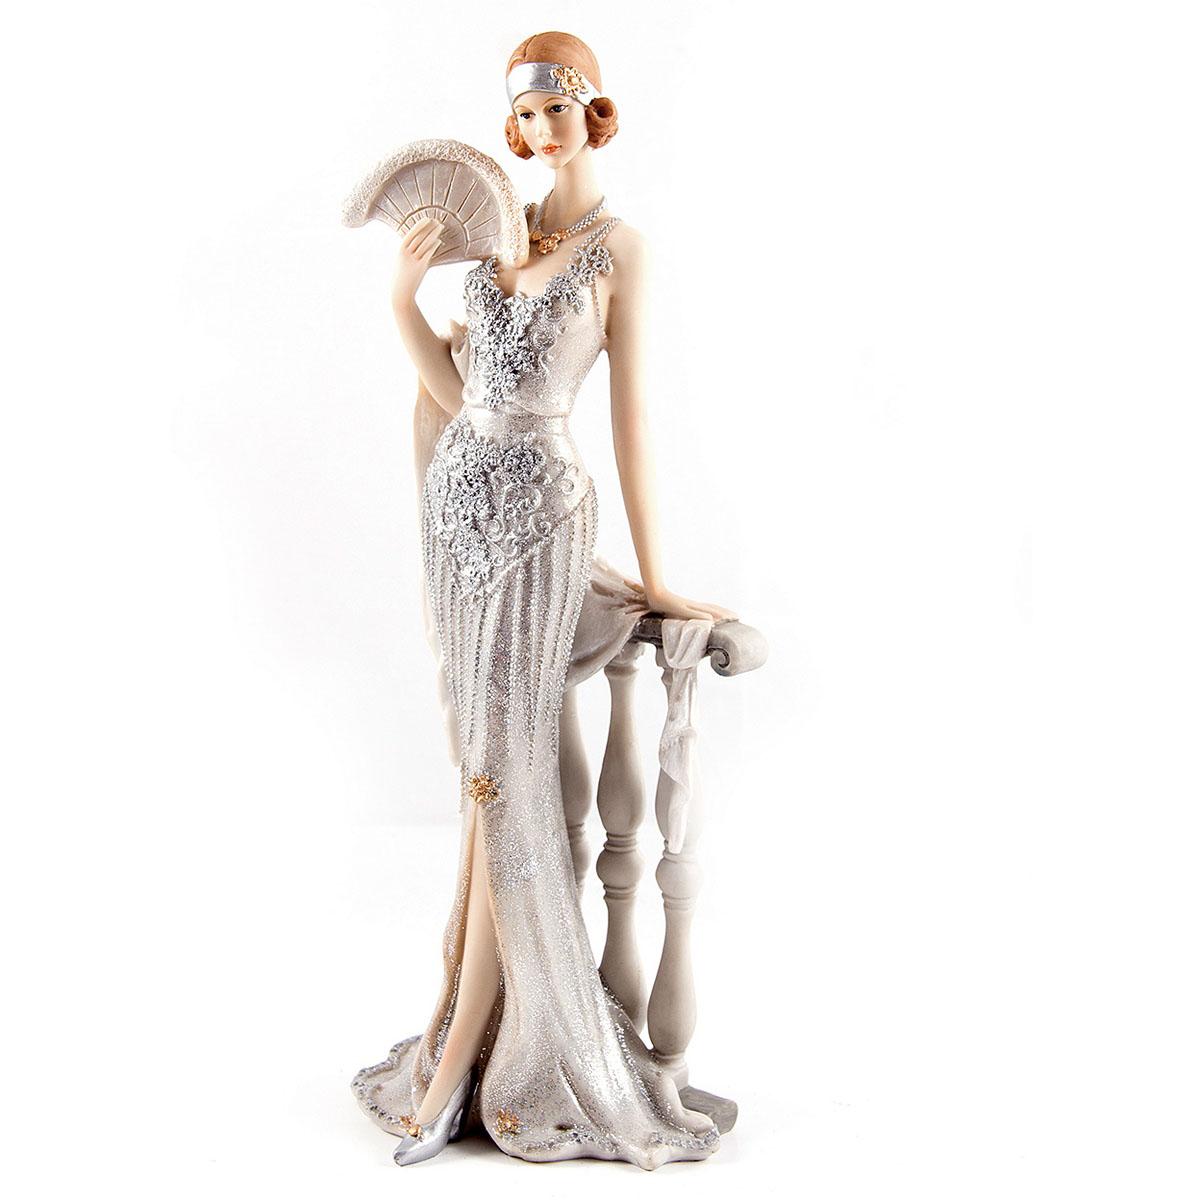 Статуэтка Русские Подарки Мисс Утонченность, 12 х 10 х 34 см статуэтка русские подарки мисс рандеву 11 х 10 х 31 см